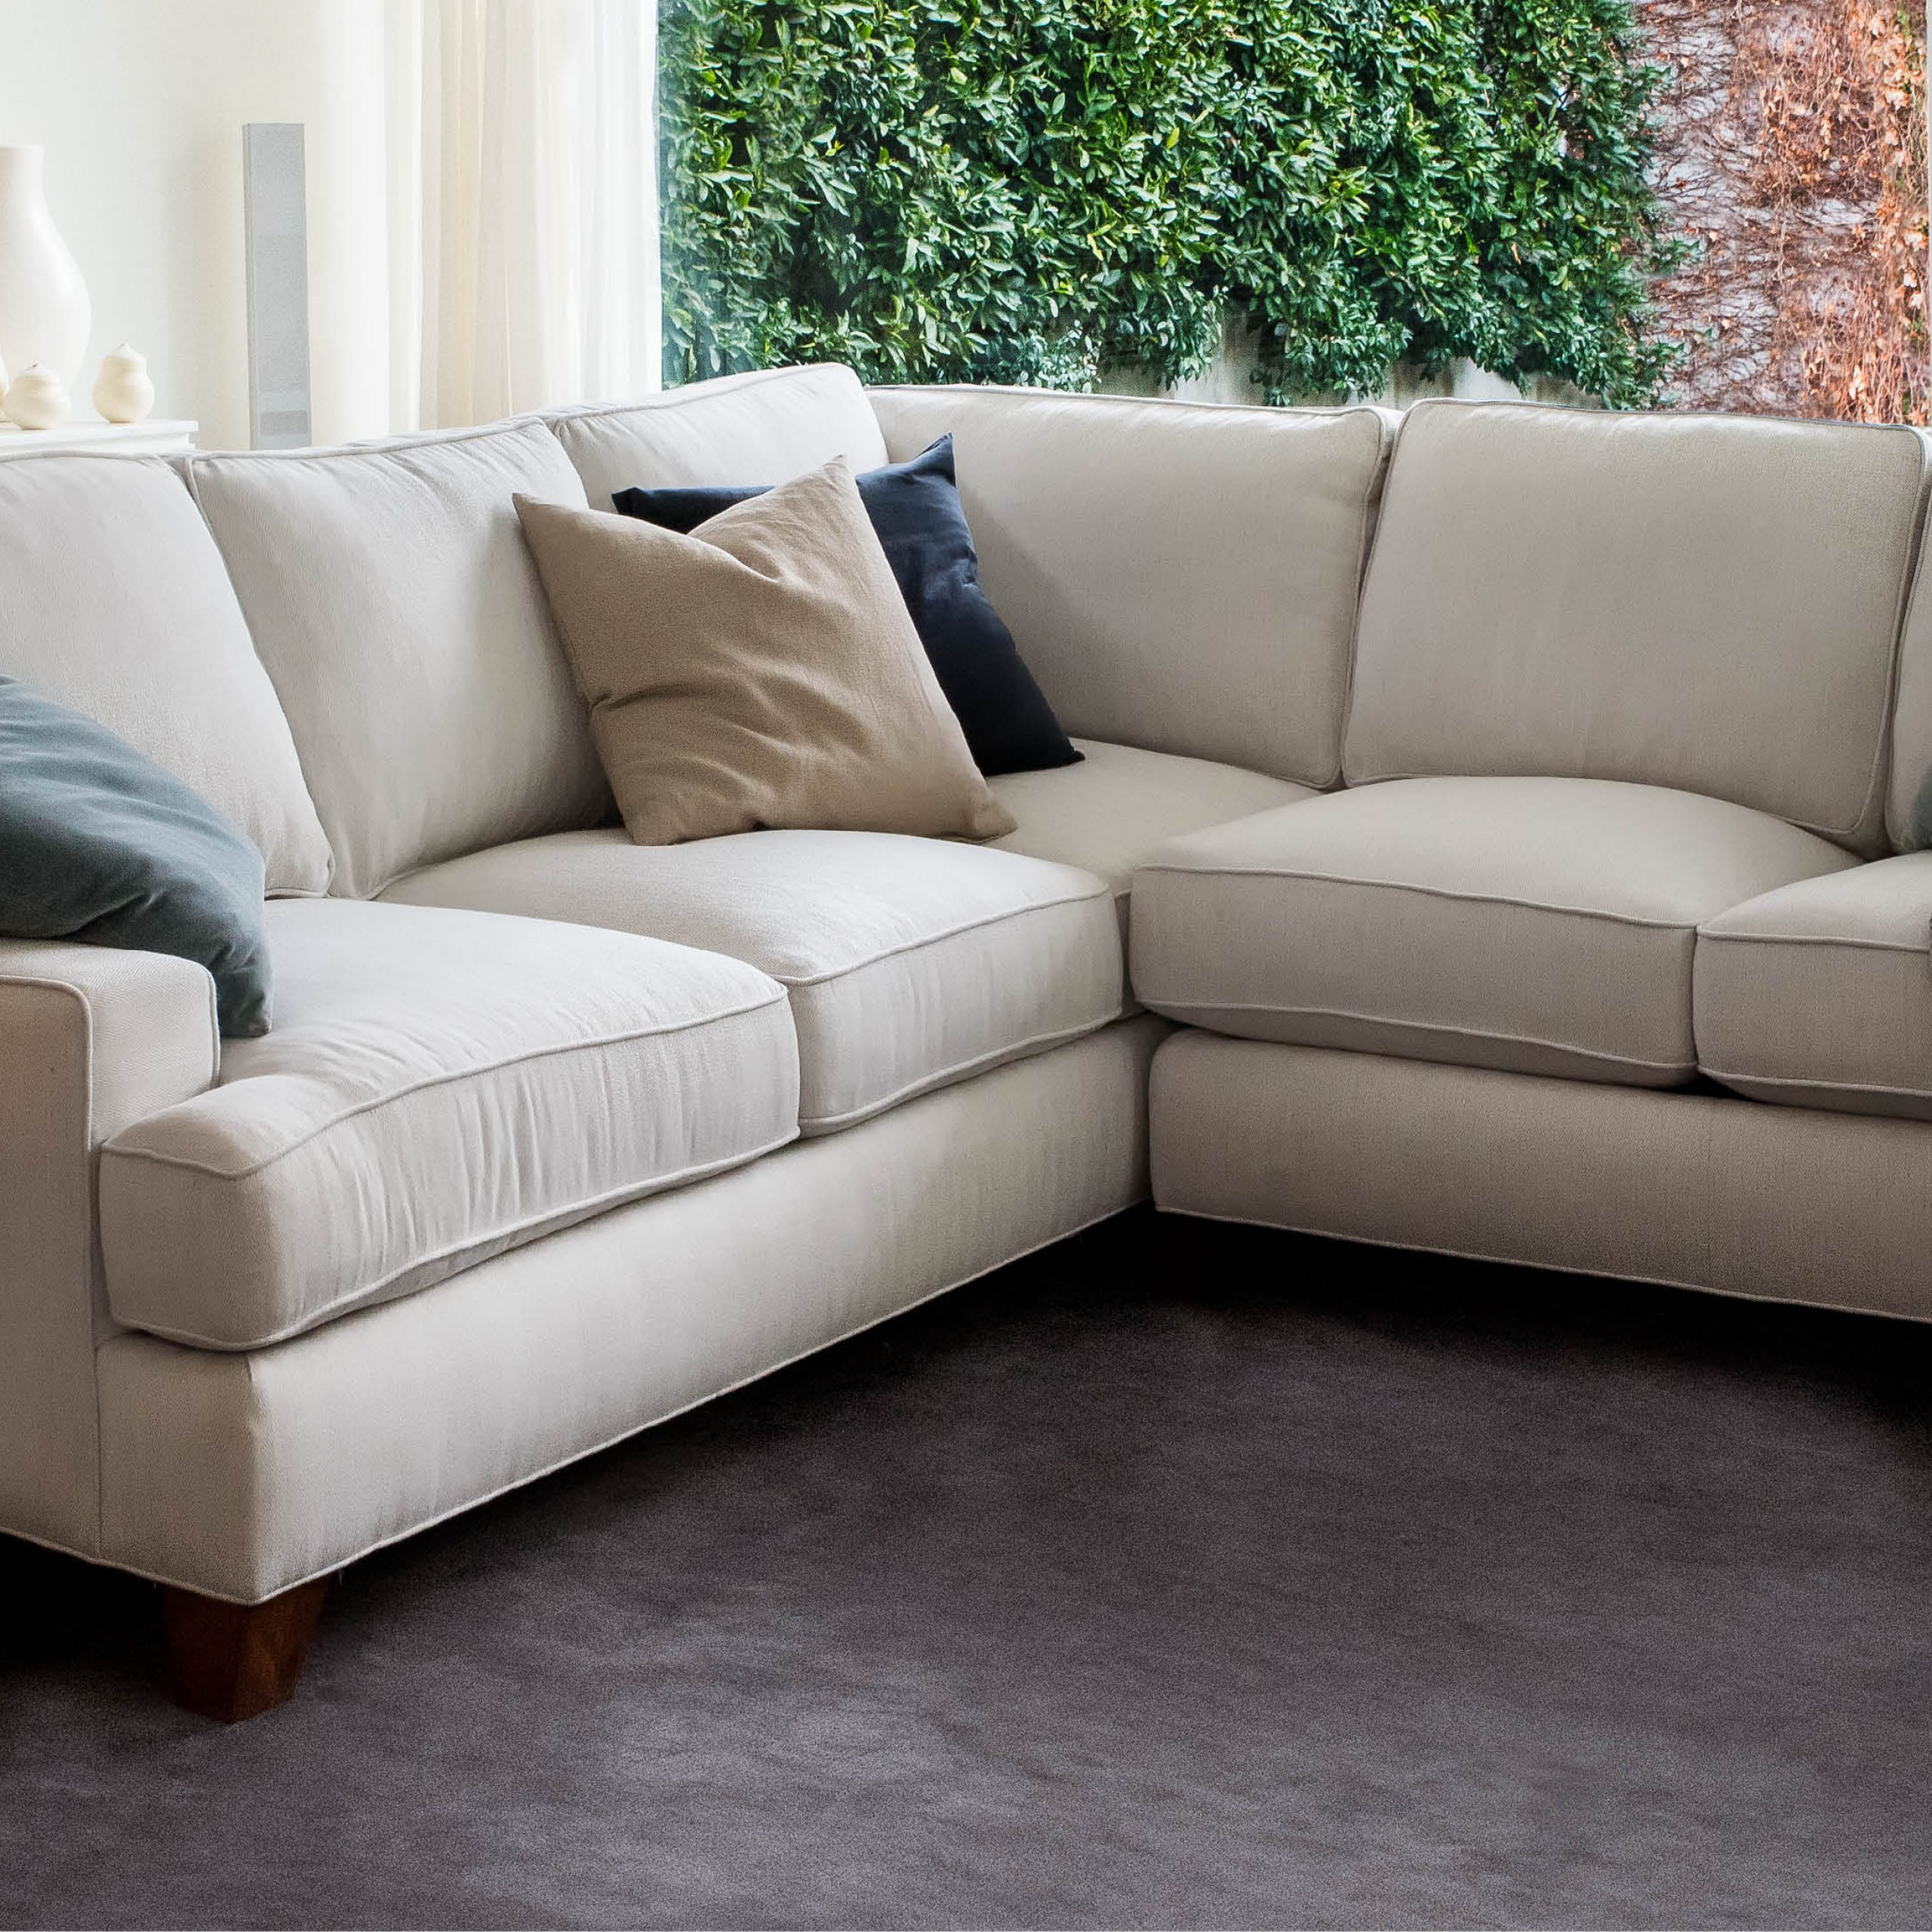 Monterey Modular Corner Sofa   Plush Sofas & Furniture With Modular Corner Sofas (View 3 of 15)